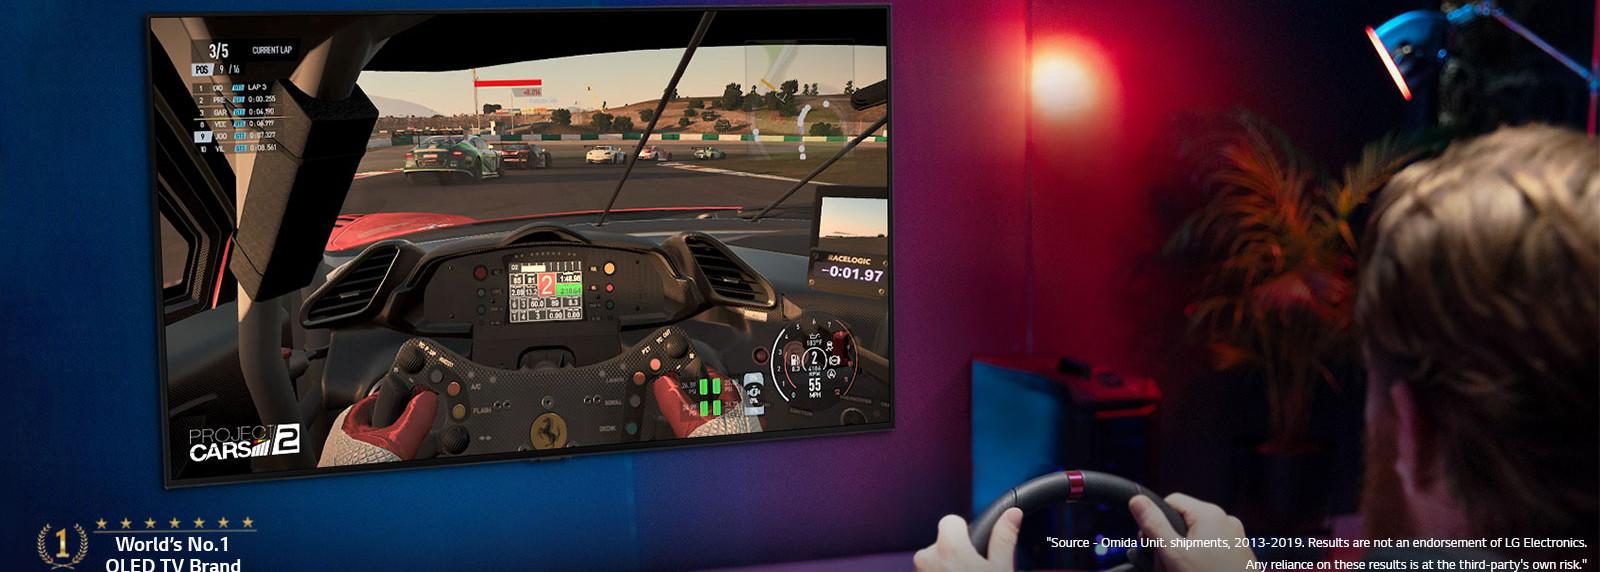 LG-OLED-GX-2020-Banner-Game-Desktop_t1.j